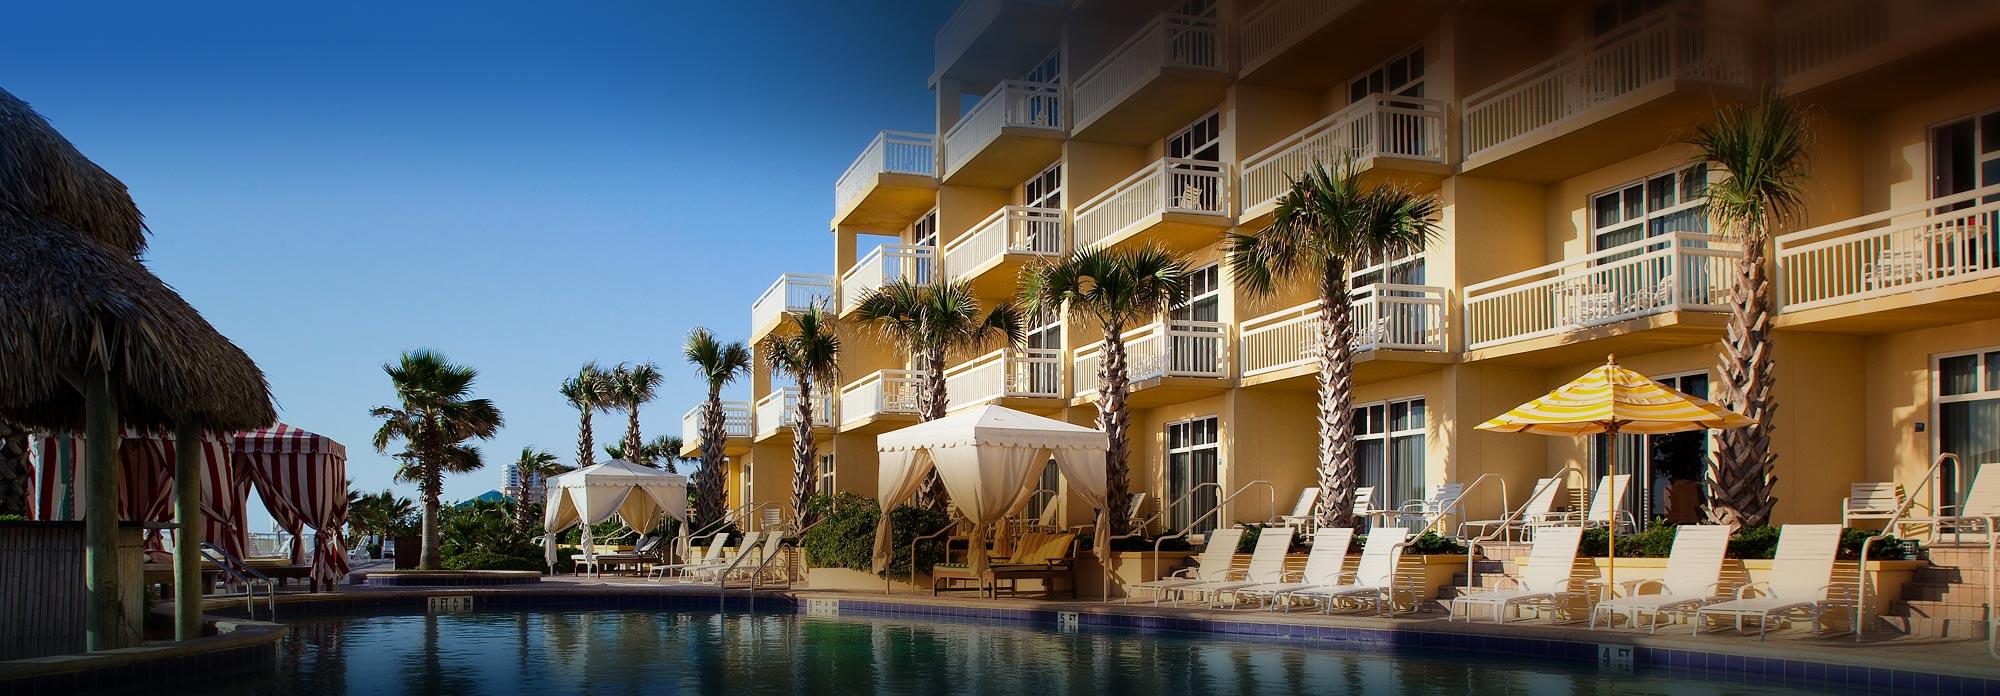 the shores resort spa asap holdings. Black Bedroom Furniture Sets. Home Design Ideas